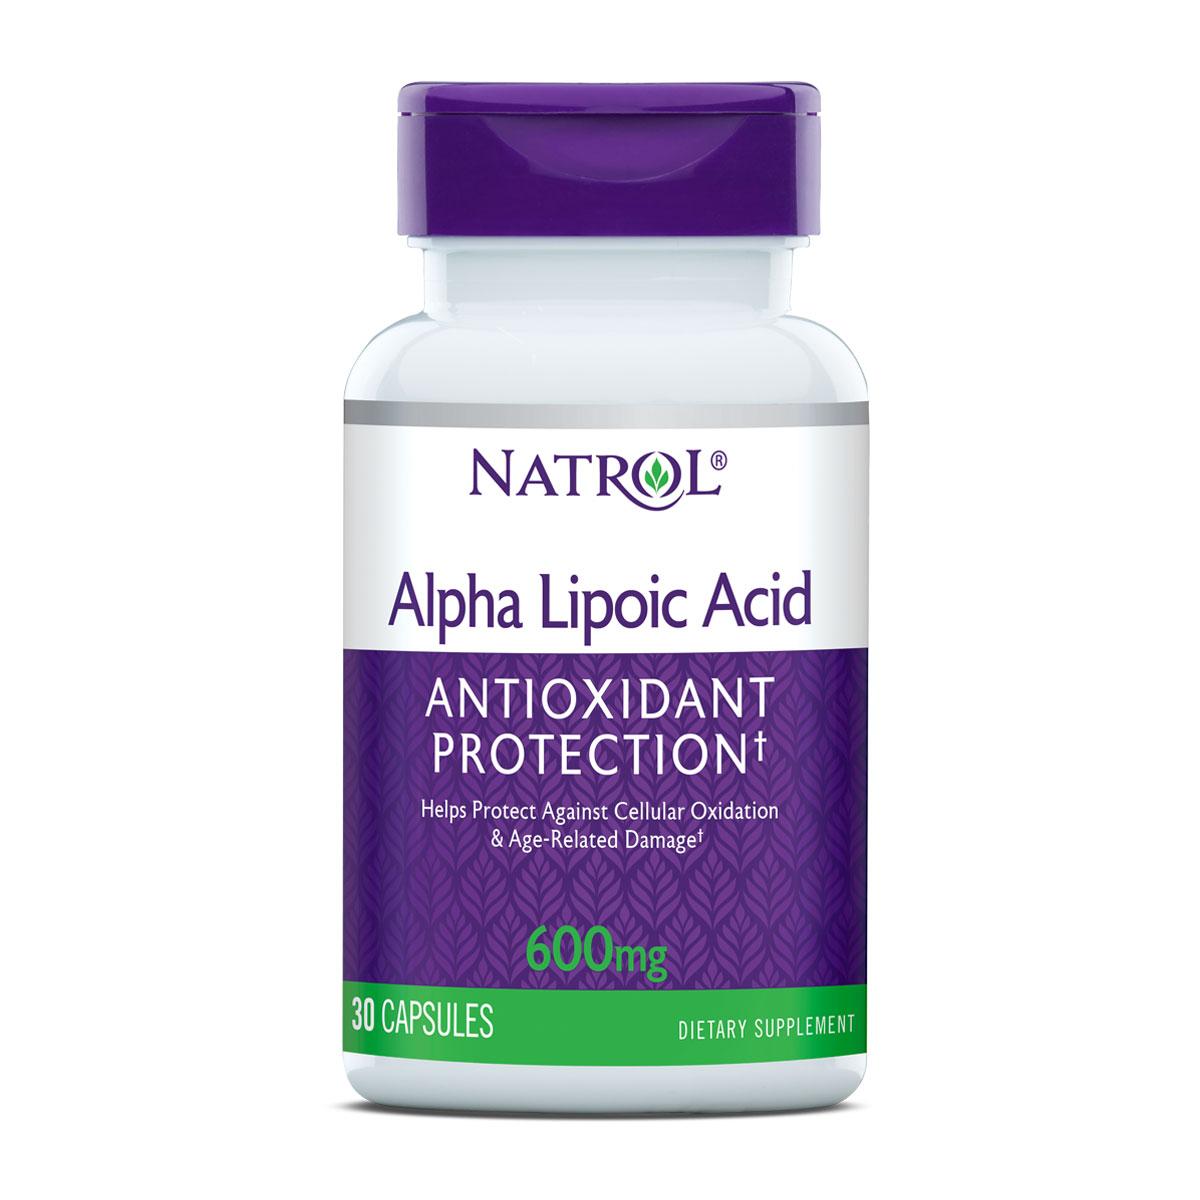 Alpha Lipoic Acid 600 mg capsules